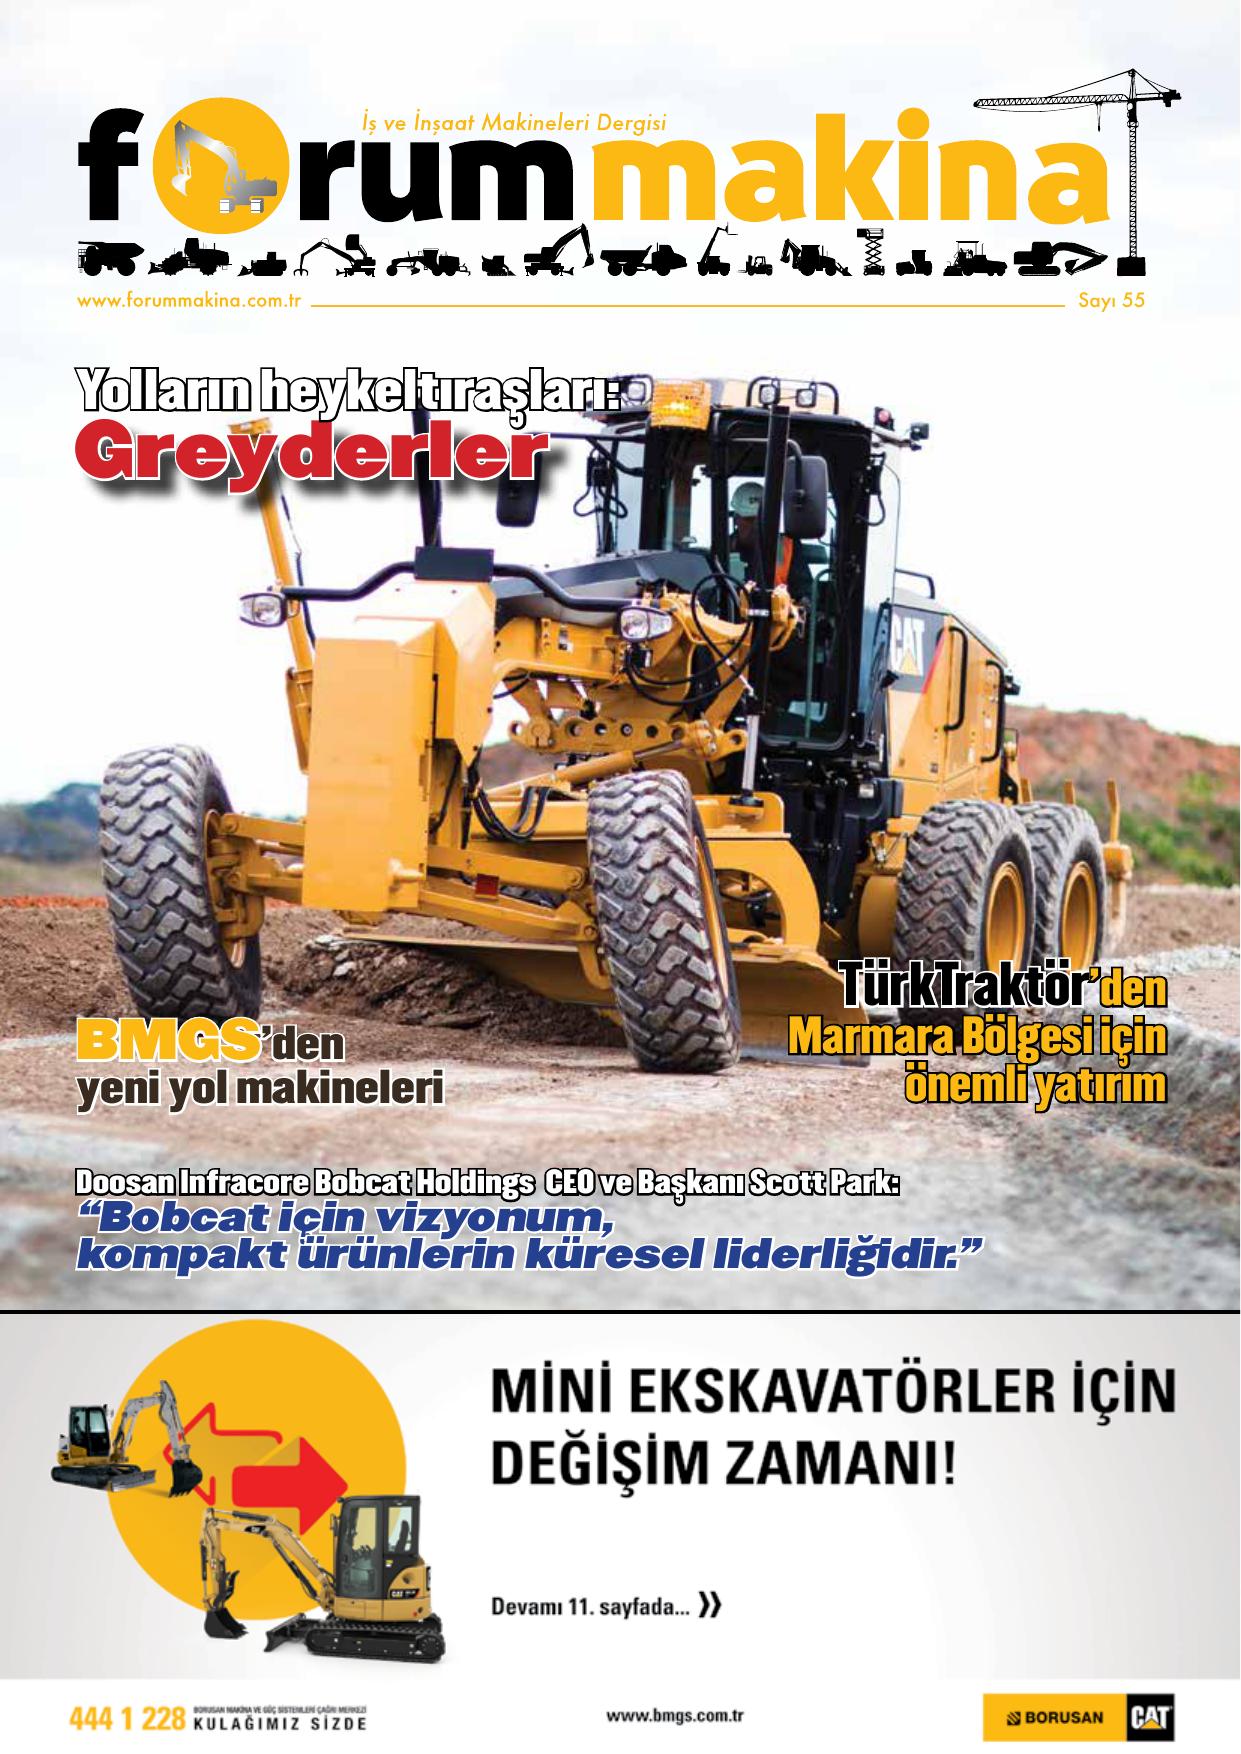 greyderler - forum makina